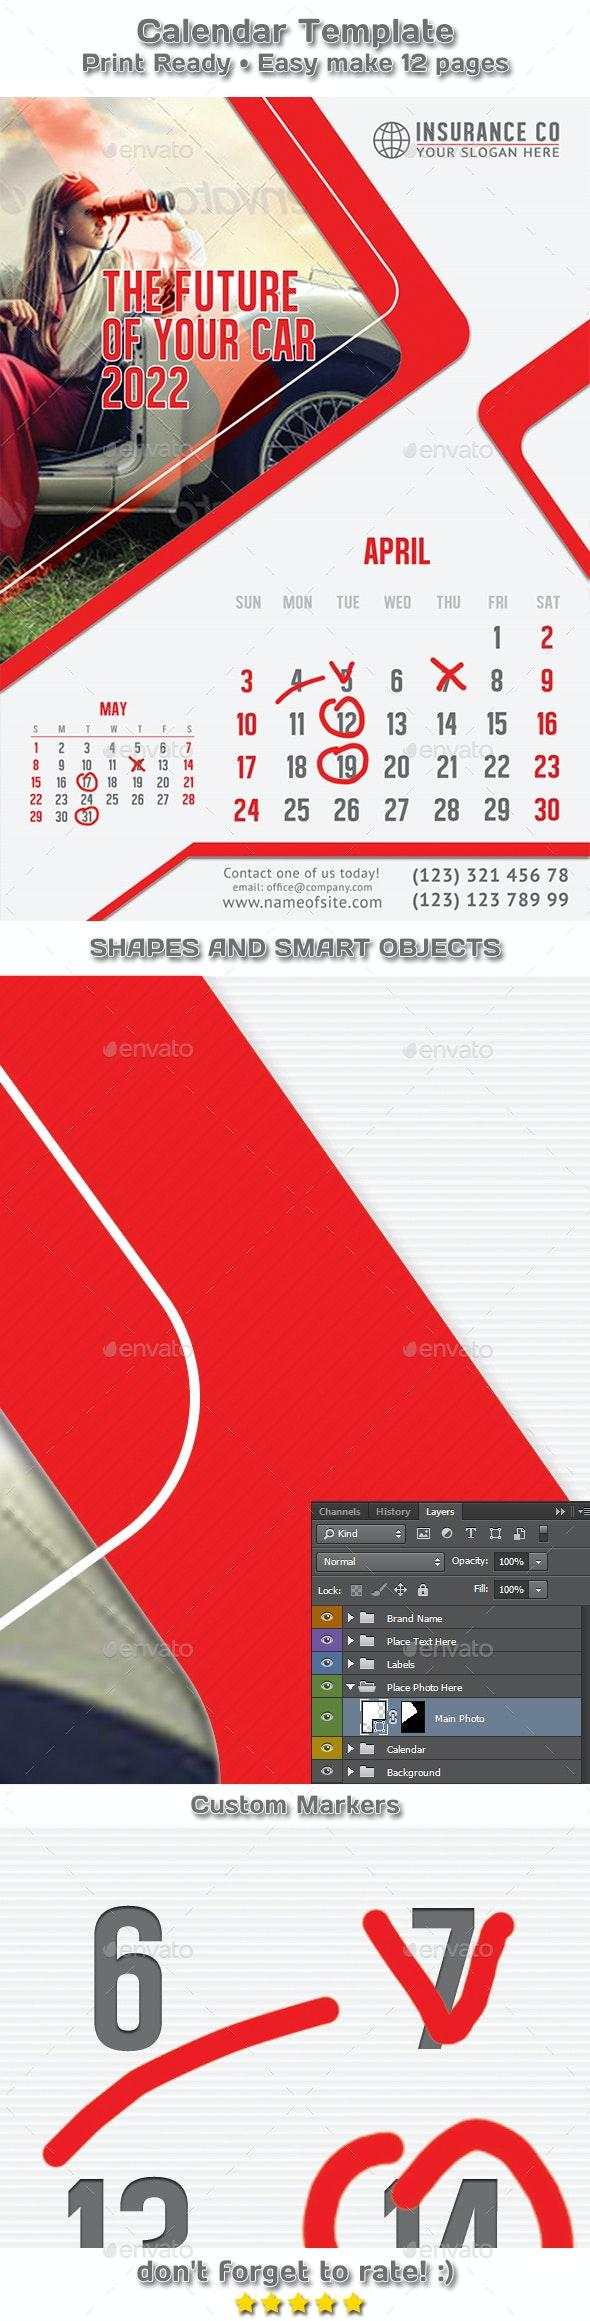 Auto Insurance Calendar 2021 - 2022 Template - Calendars Stationery